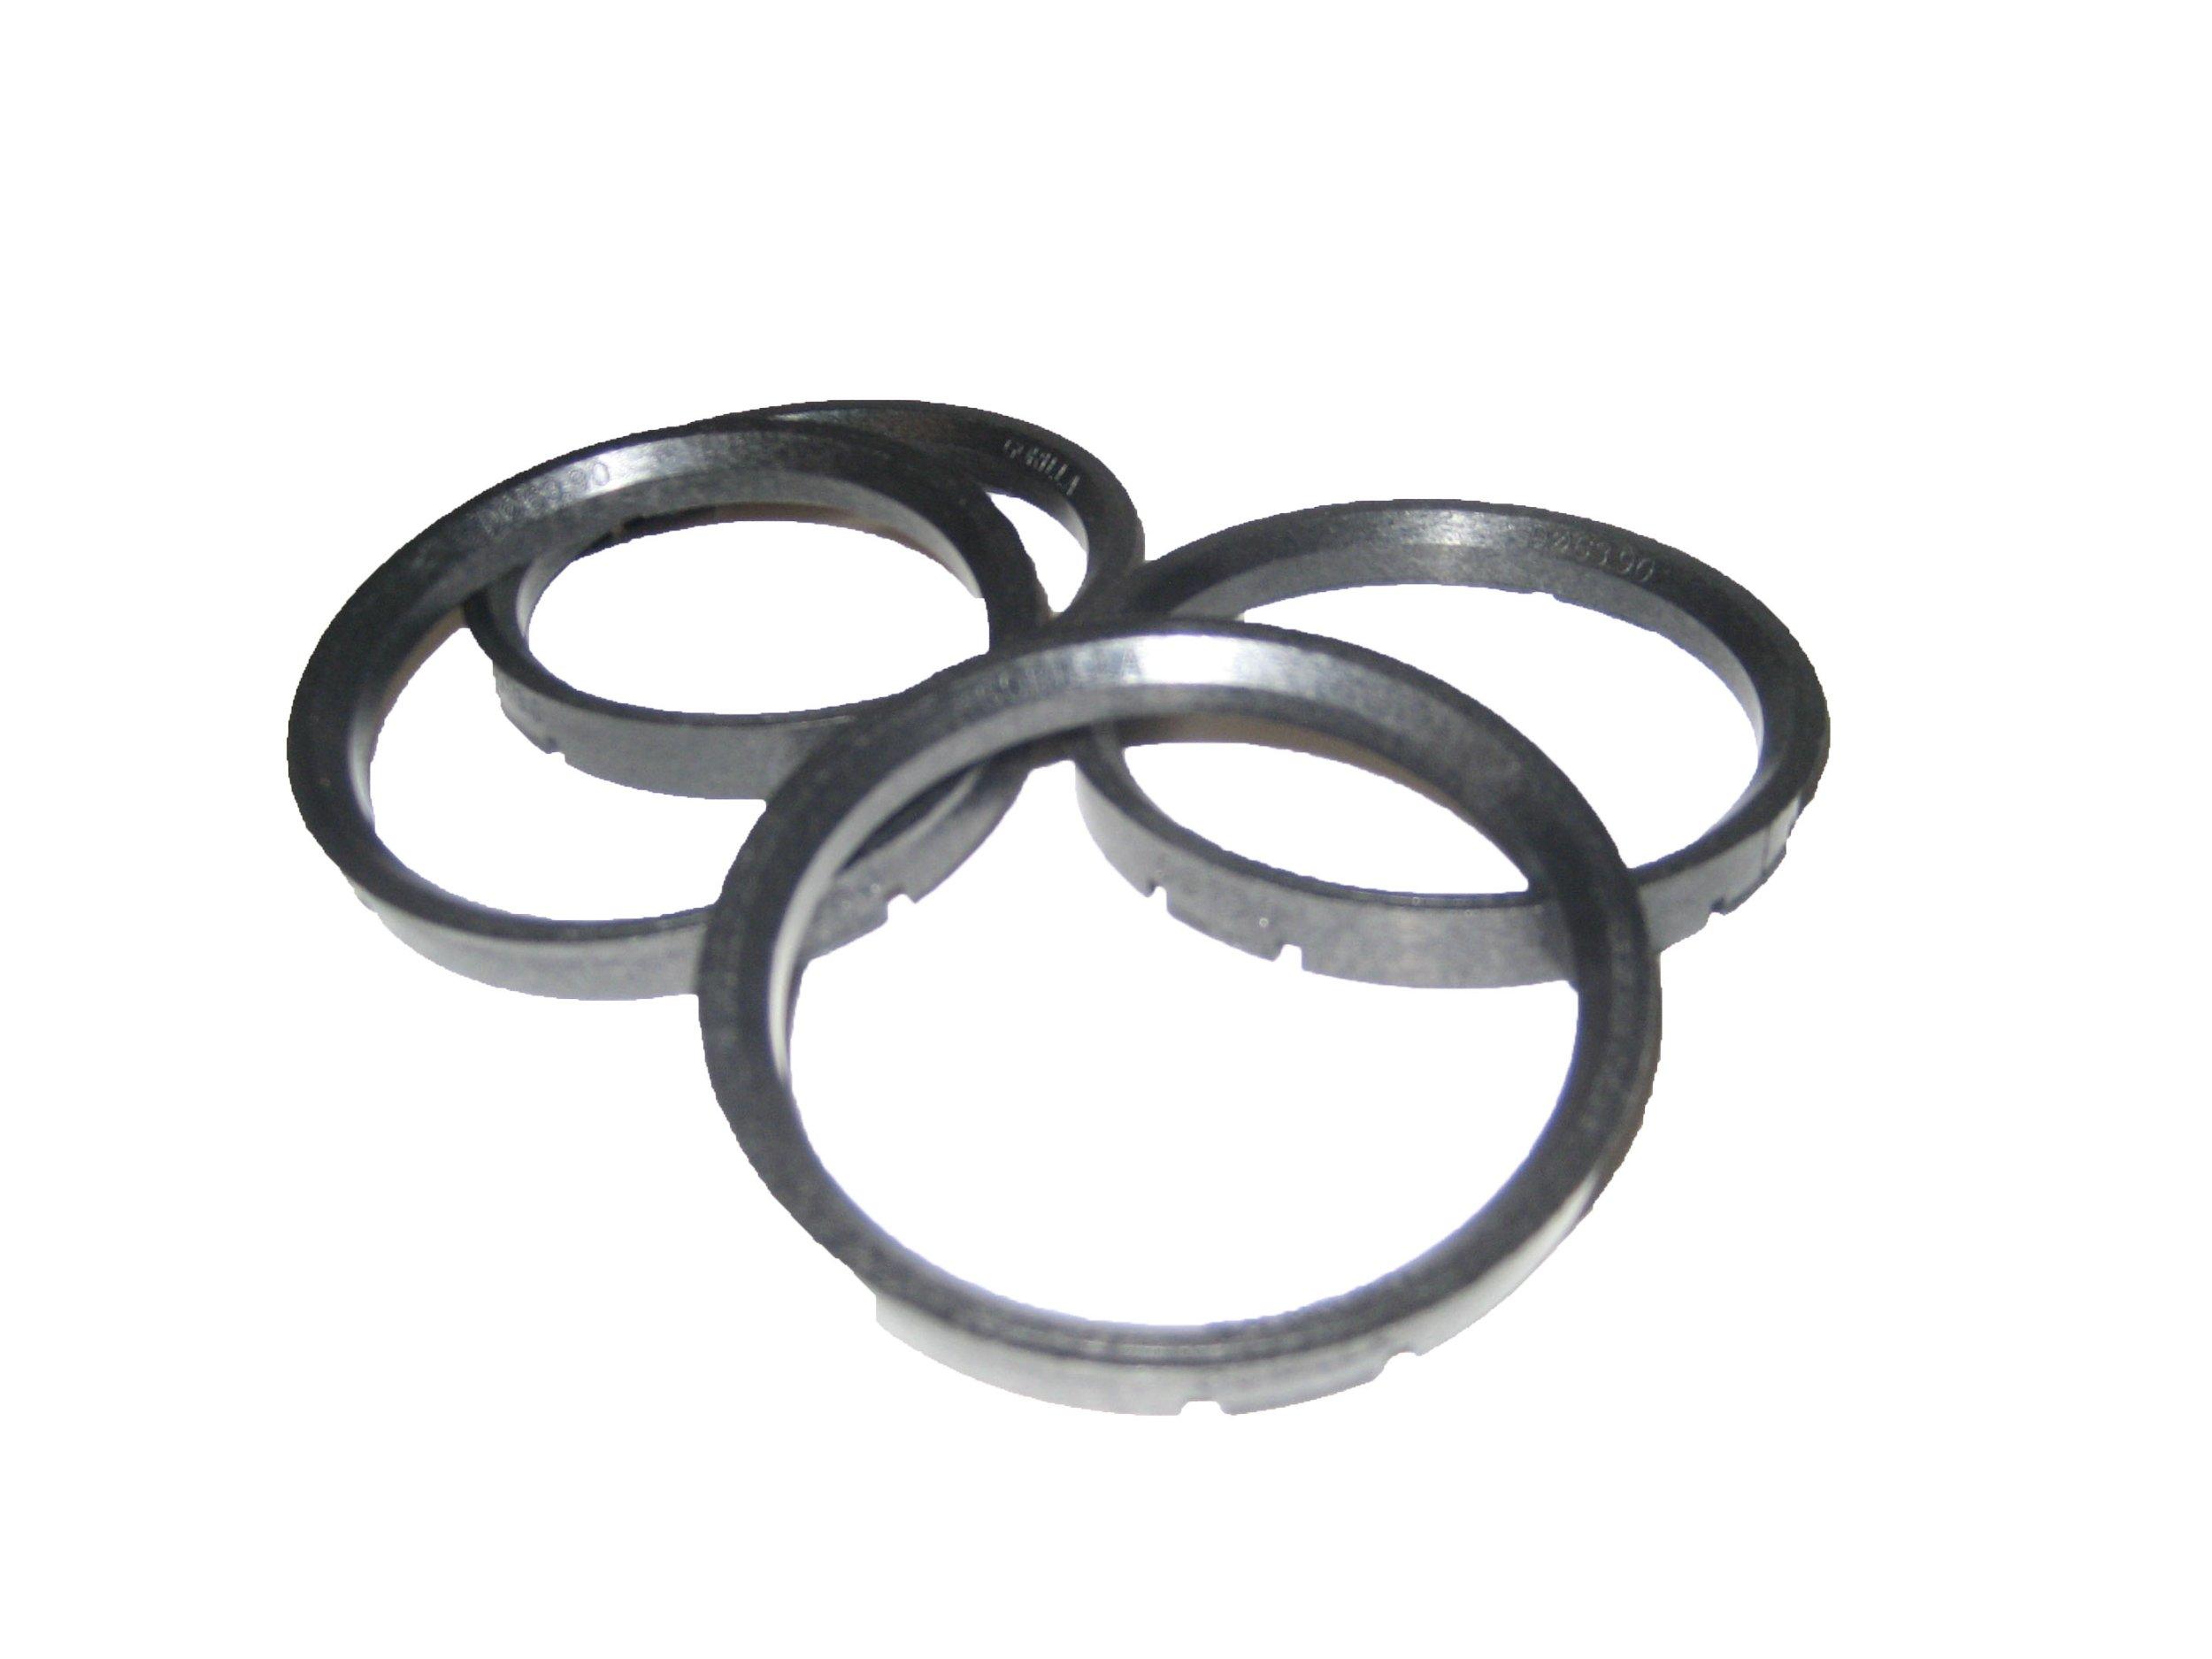 Gorilla Automotive 73-6006 Wheel Hub Centric Rings (73mm OD x 60.06mm ID) - Pack of 4